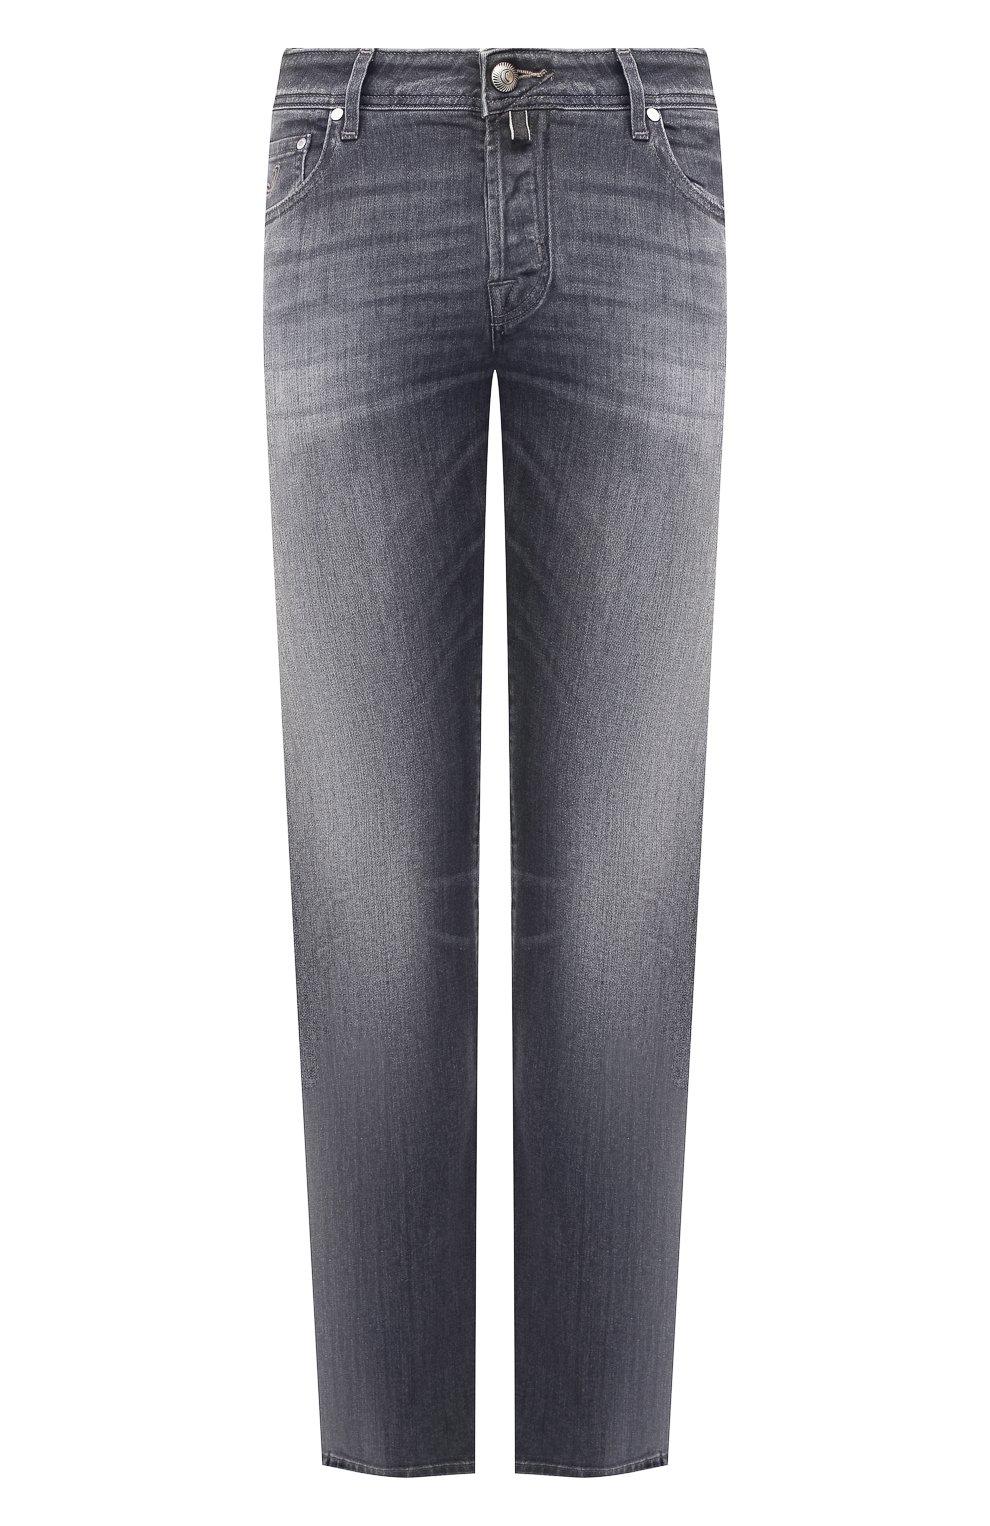 Мужские джинсы JACOB COHEN серого цвета, арт. J620 C0MF 01578-W2/52 | Фото 1